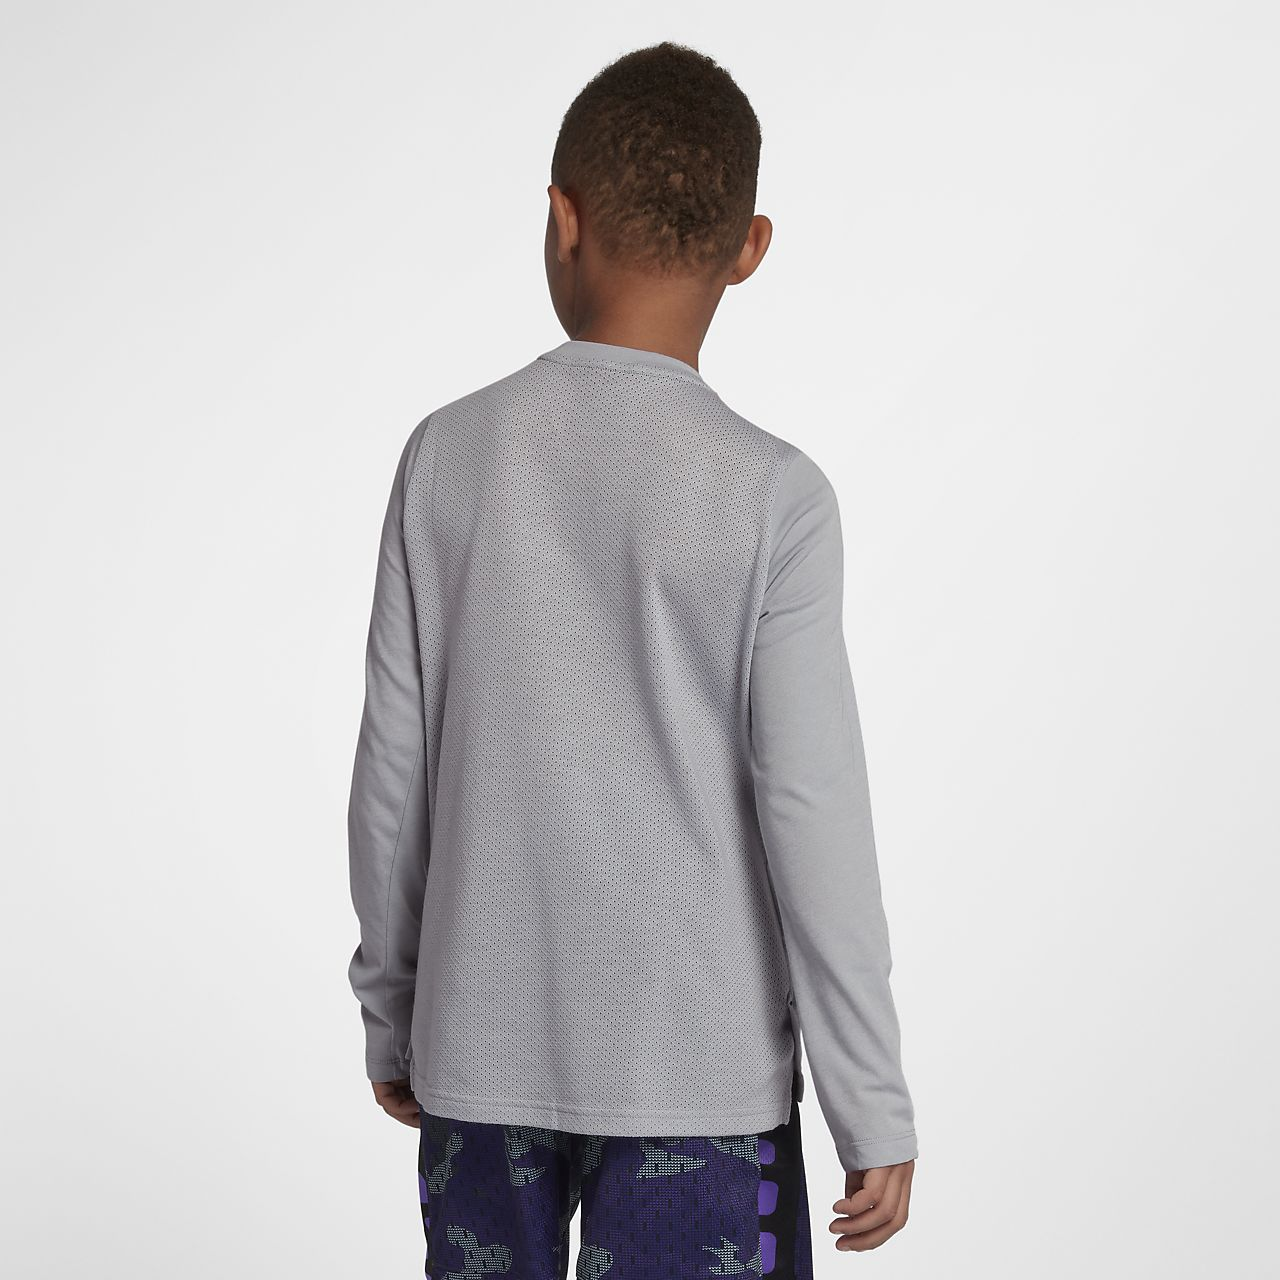 1fbddd9695c2 Nike Dri-FIT Elite Big Kids  (Boys ) Long Sleeve Basketball Top ...